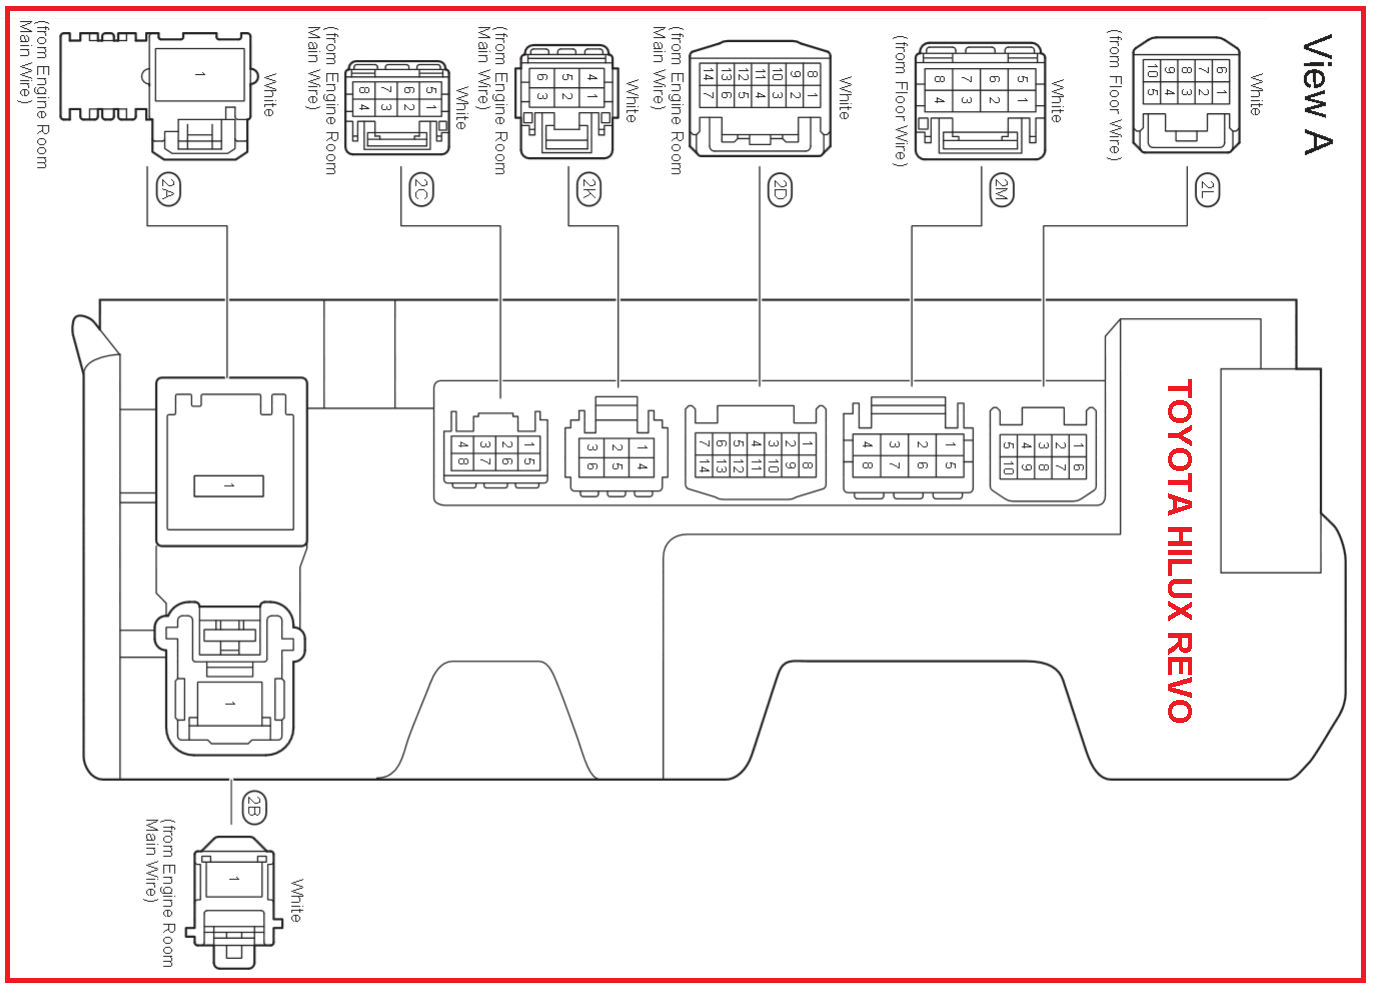 toyota hilux revo wiring wiring diagram toolbox toyota hilux revo wiring [ 1374 x 986 Pixel ]